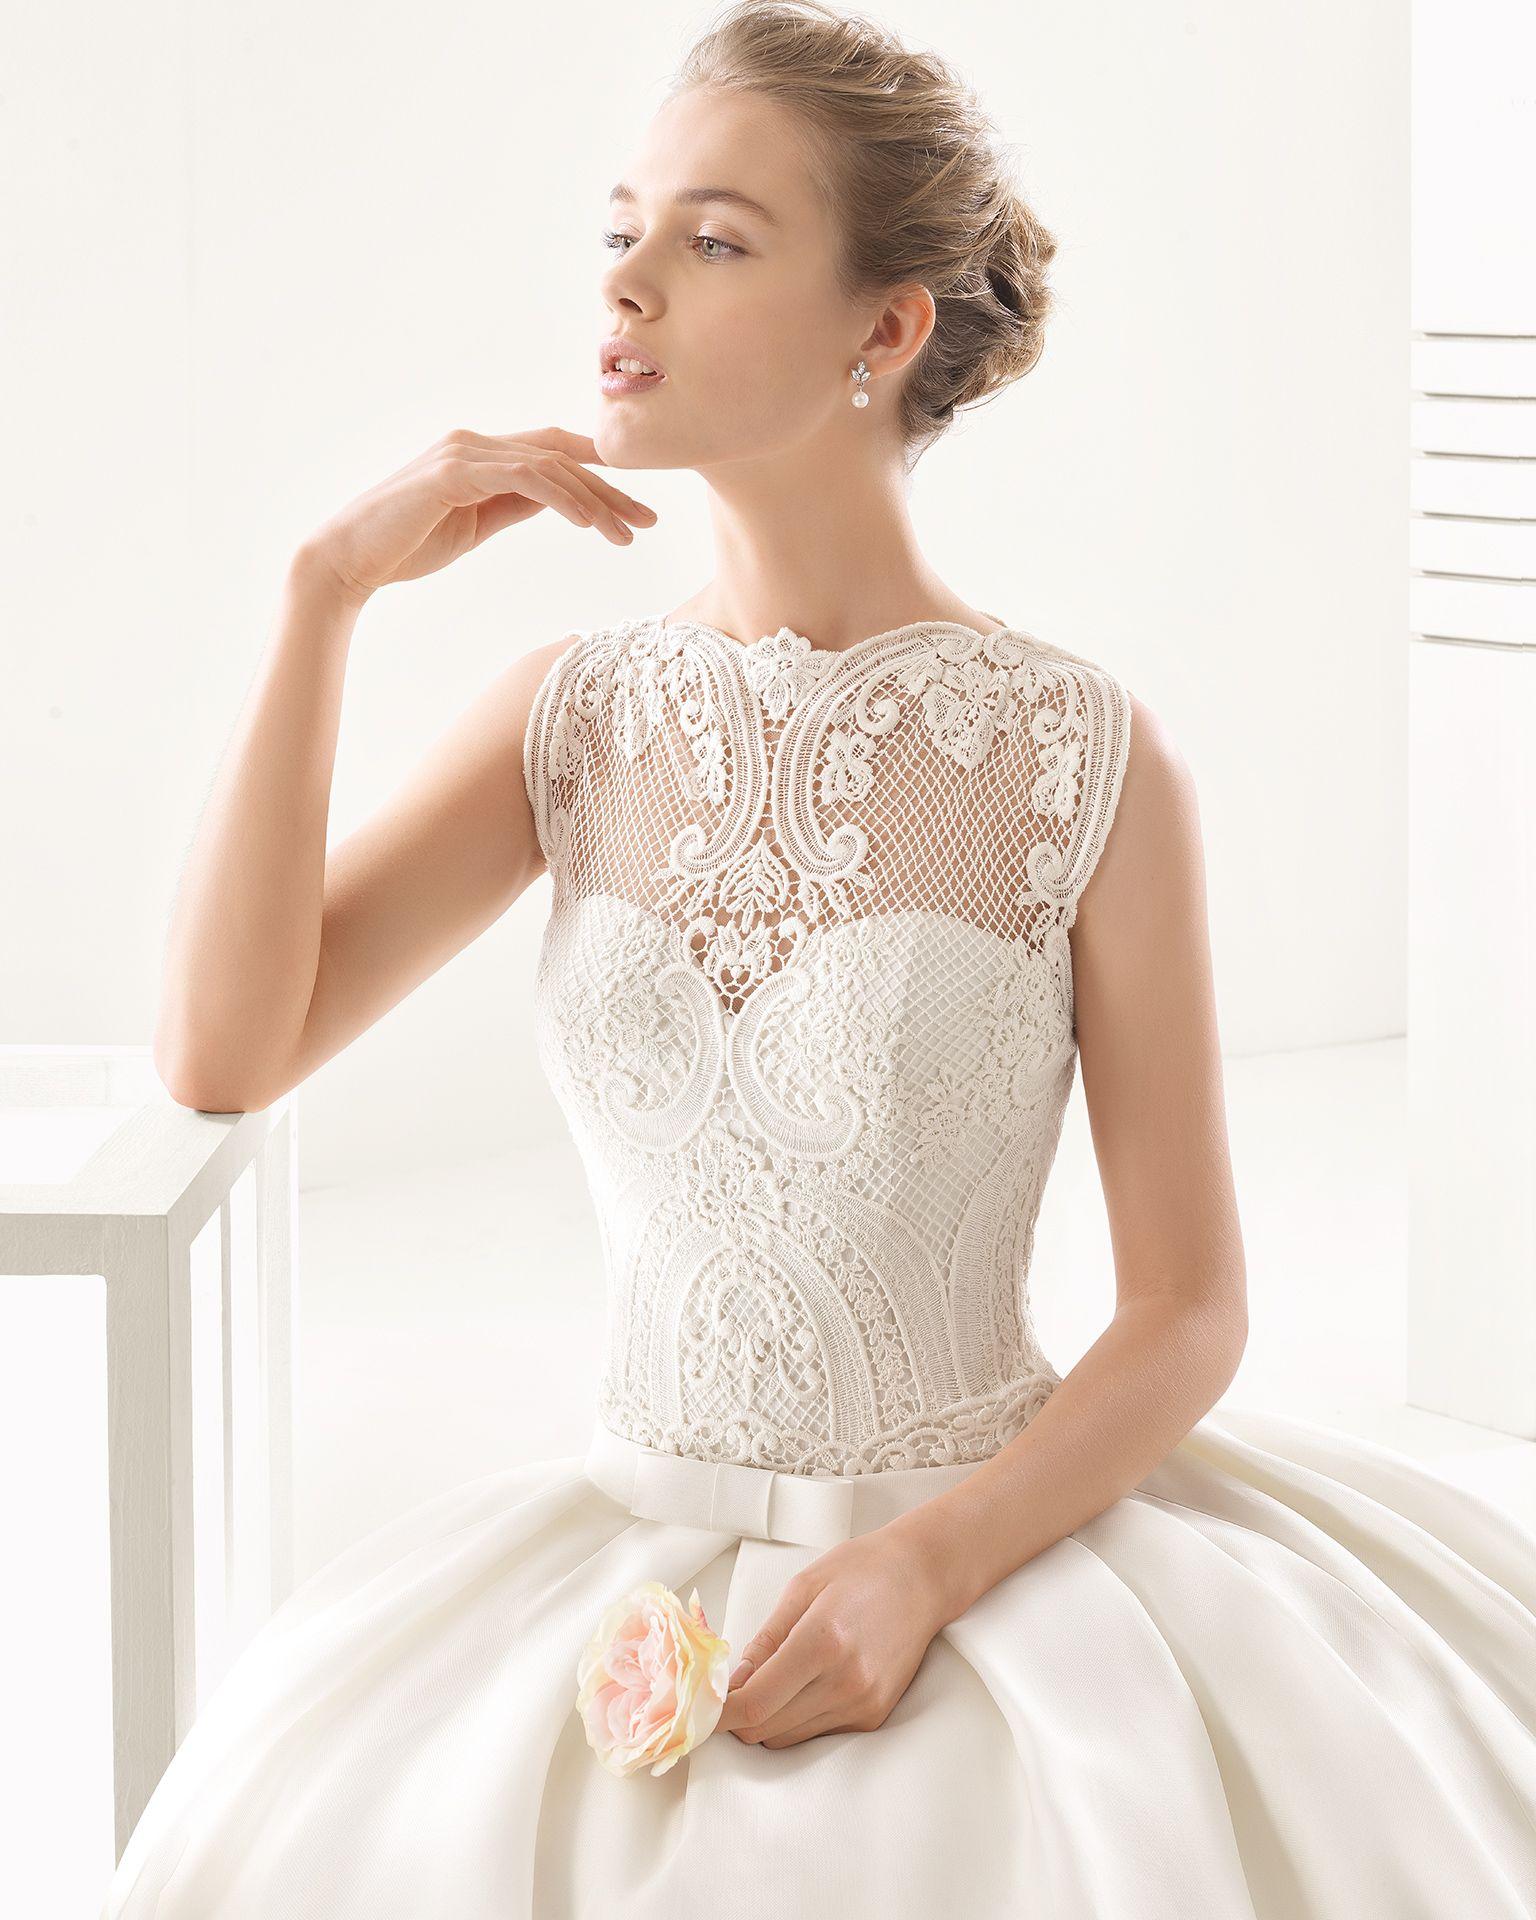 Pink lace wedding dress  Najera  Novia  Colección  Rosa clara Wedding dress and Weddings